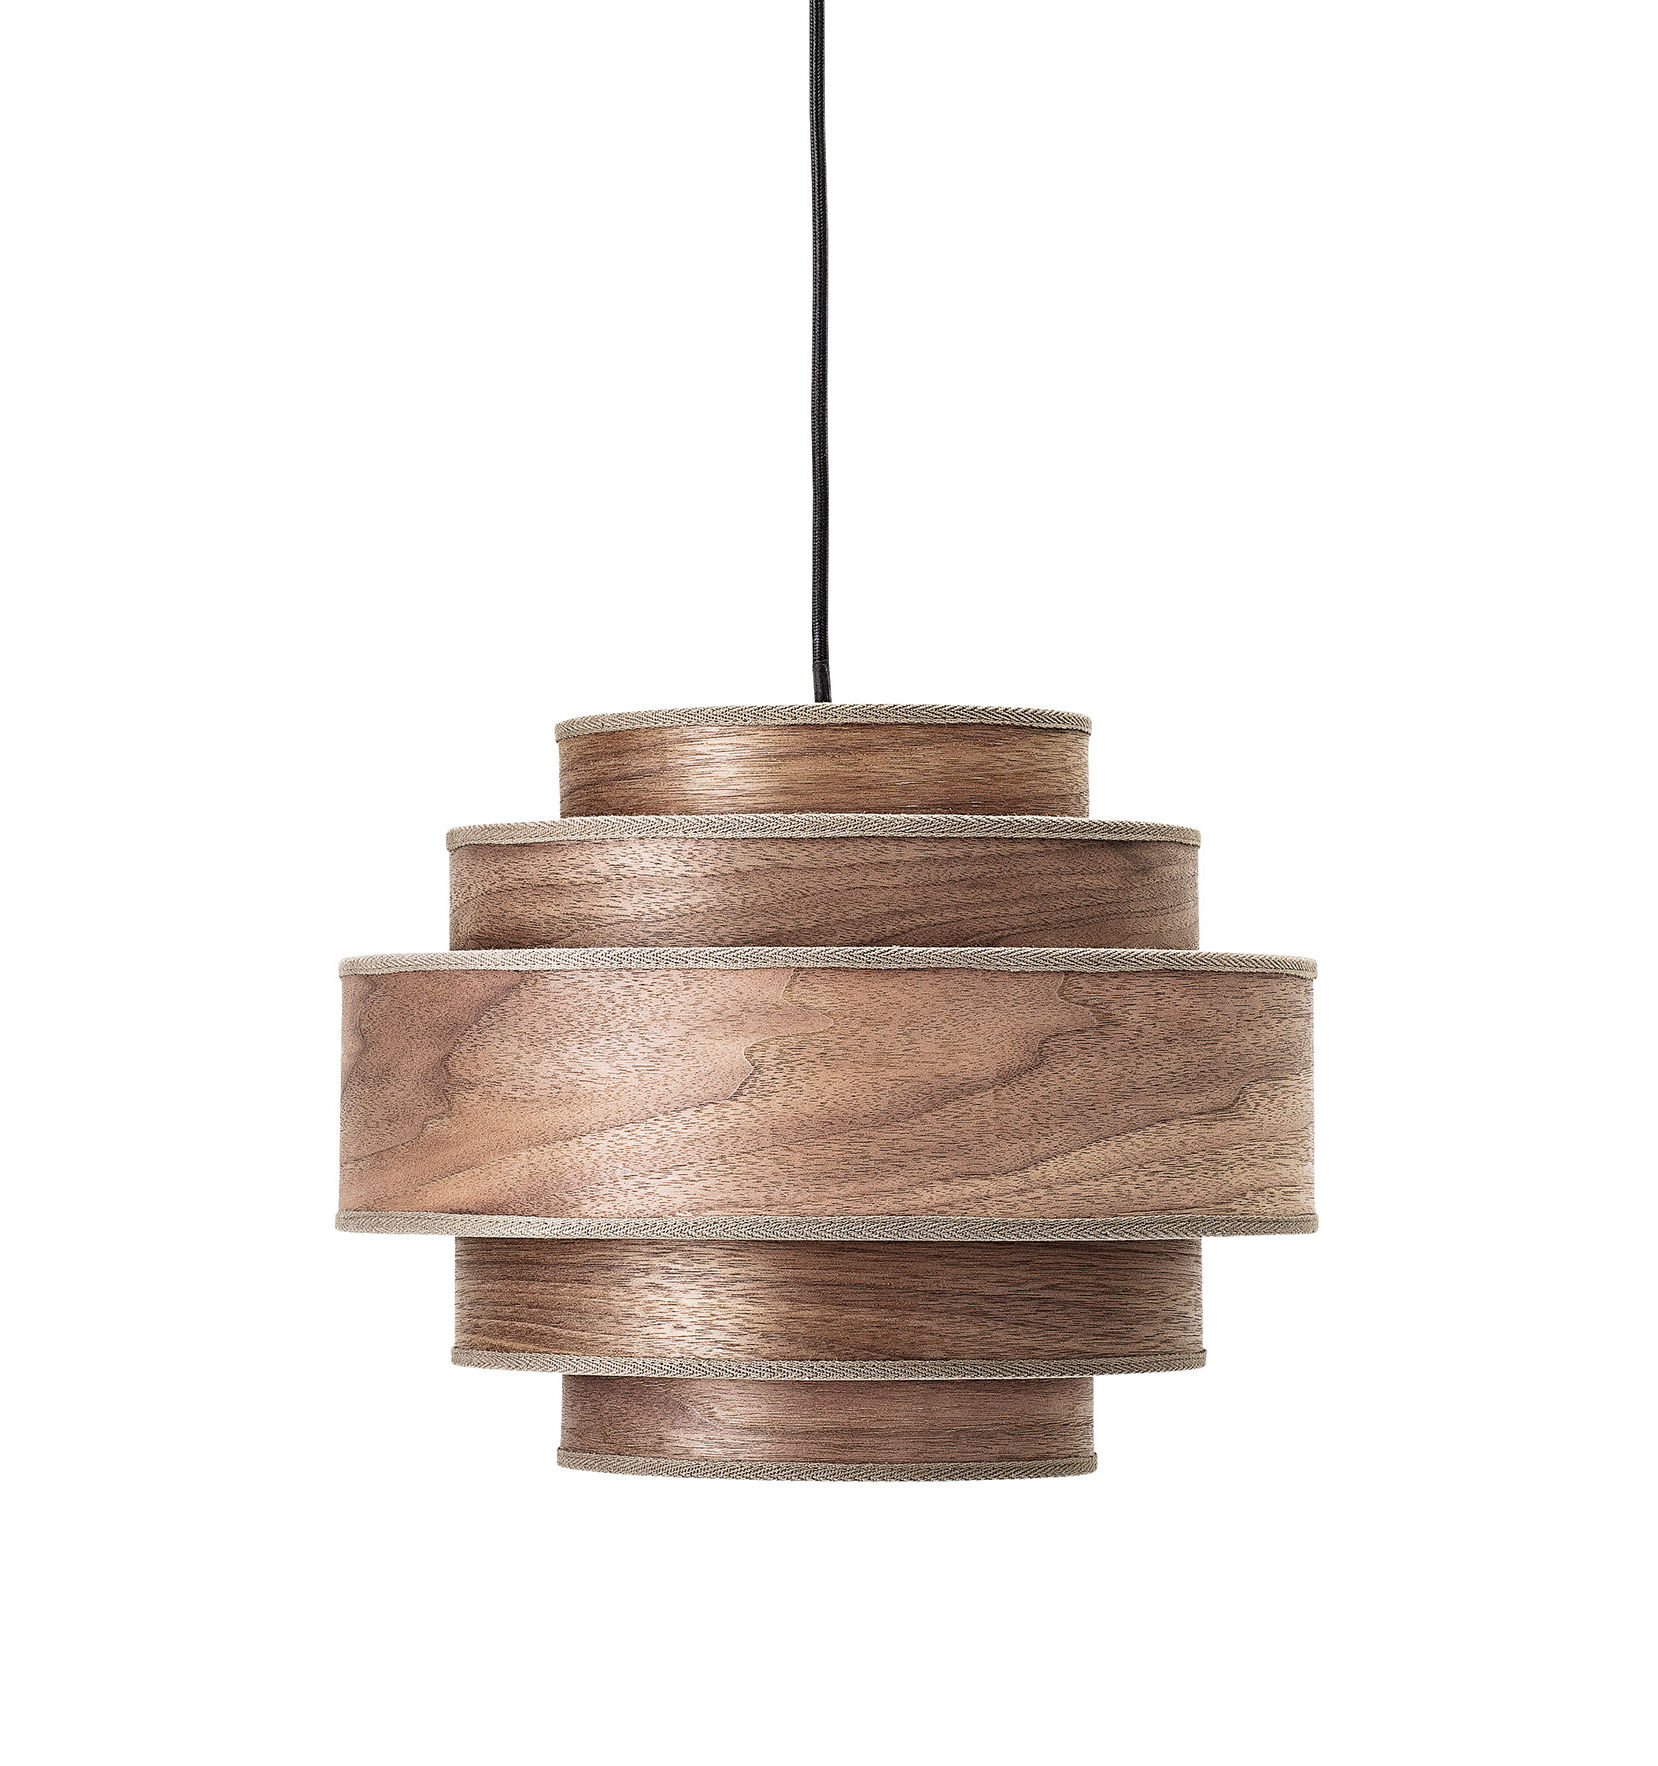 Lighting - Pendant Lighting - Pendant - / Walnut - Ø 35 x H 28 cm by Bloomingville - Dark walnut - Walnut